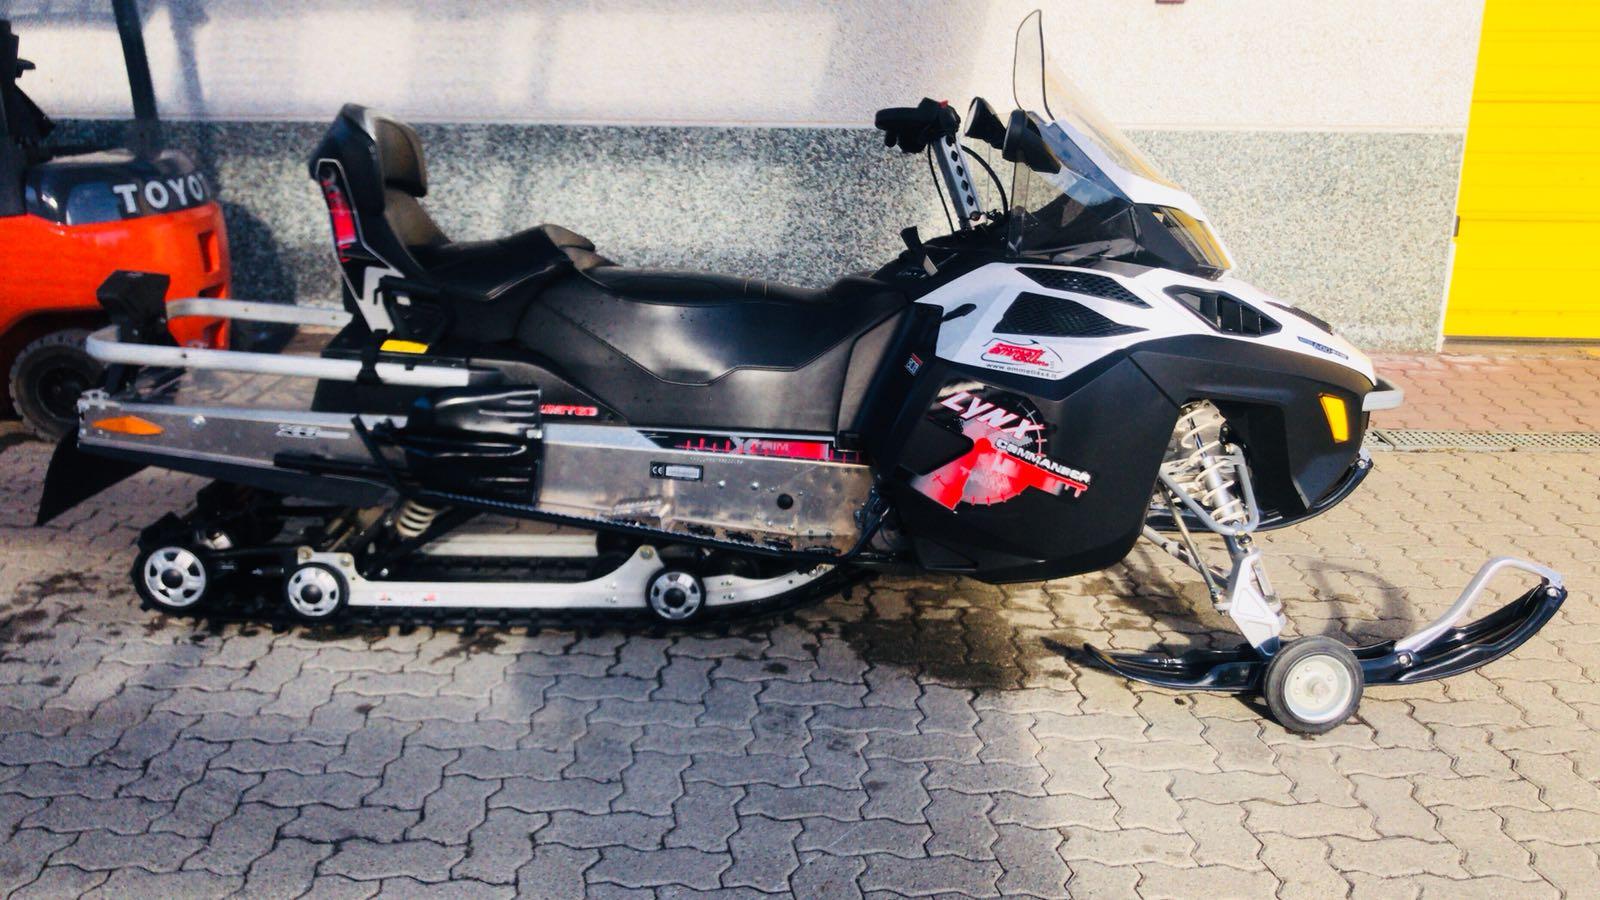 emmeti motoslitte usate susa brp lynx commander xtrim 600 e-tech 1